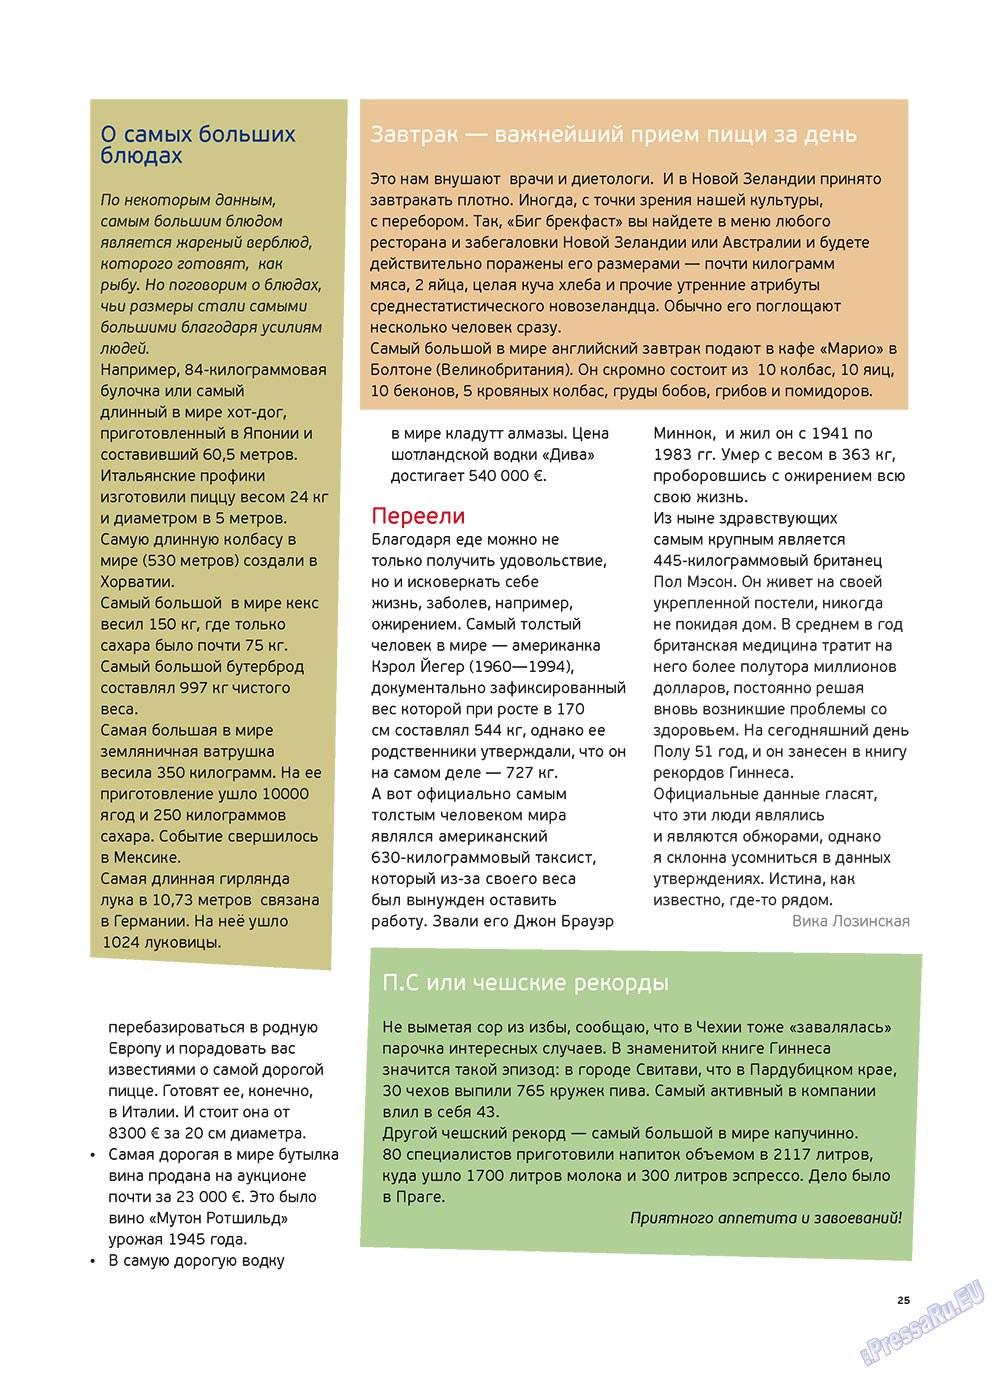 Артек (журнал). 2011 год, номер 4, стр. 27